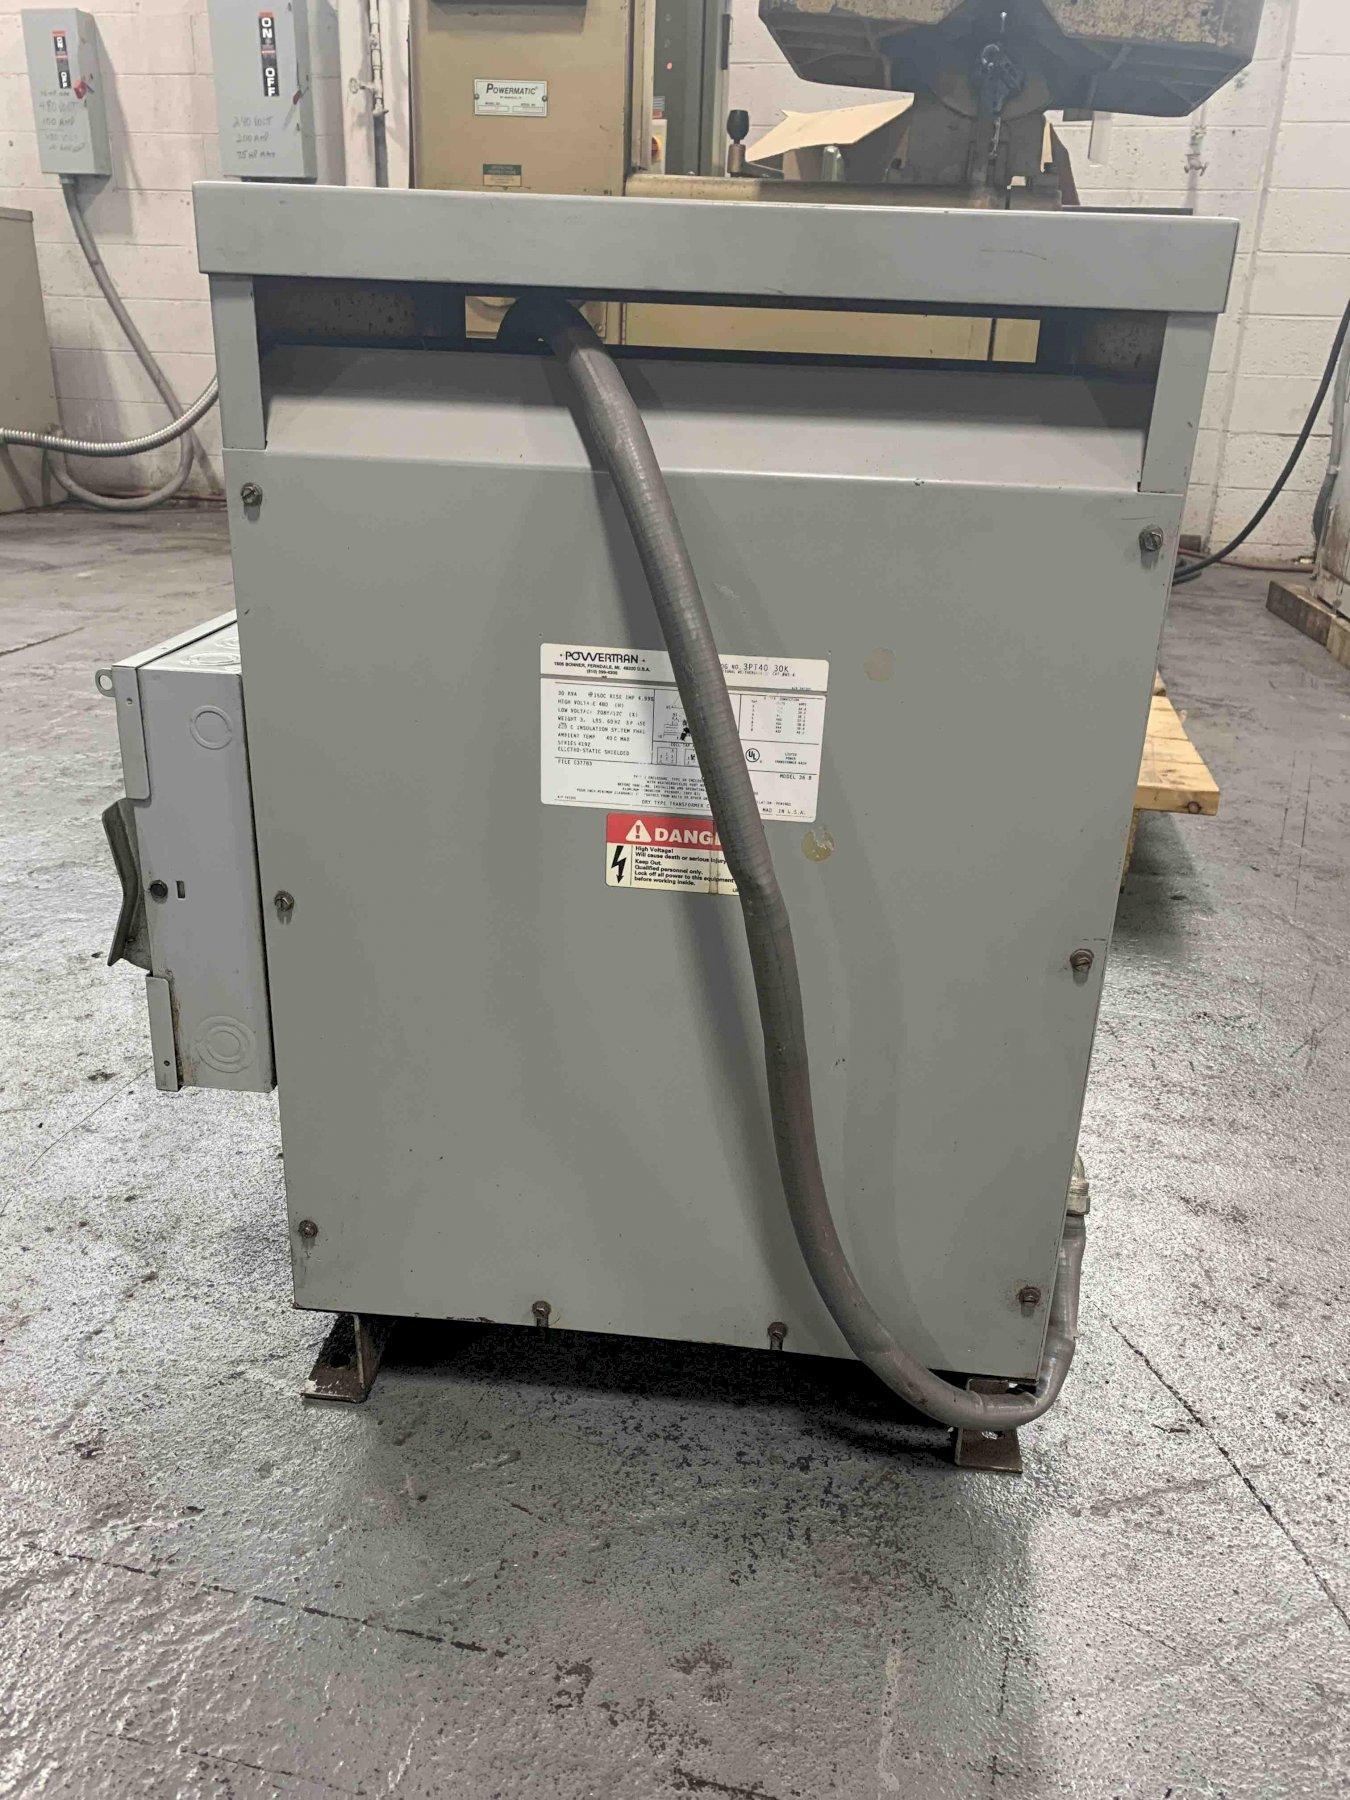 USED POWERTRAN 30 KVA 208 TO 480 VOLT TRANSFORMER MODEL 36B, Stock # 10750